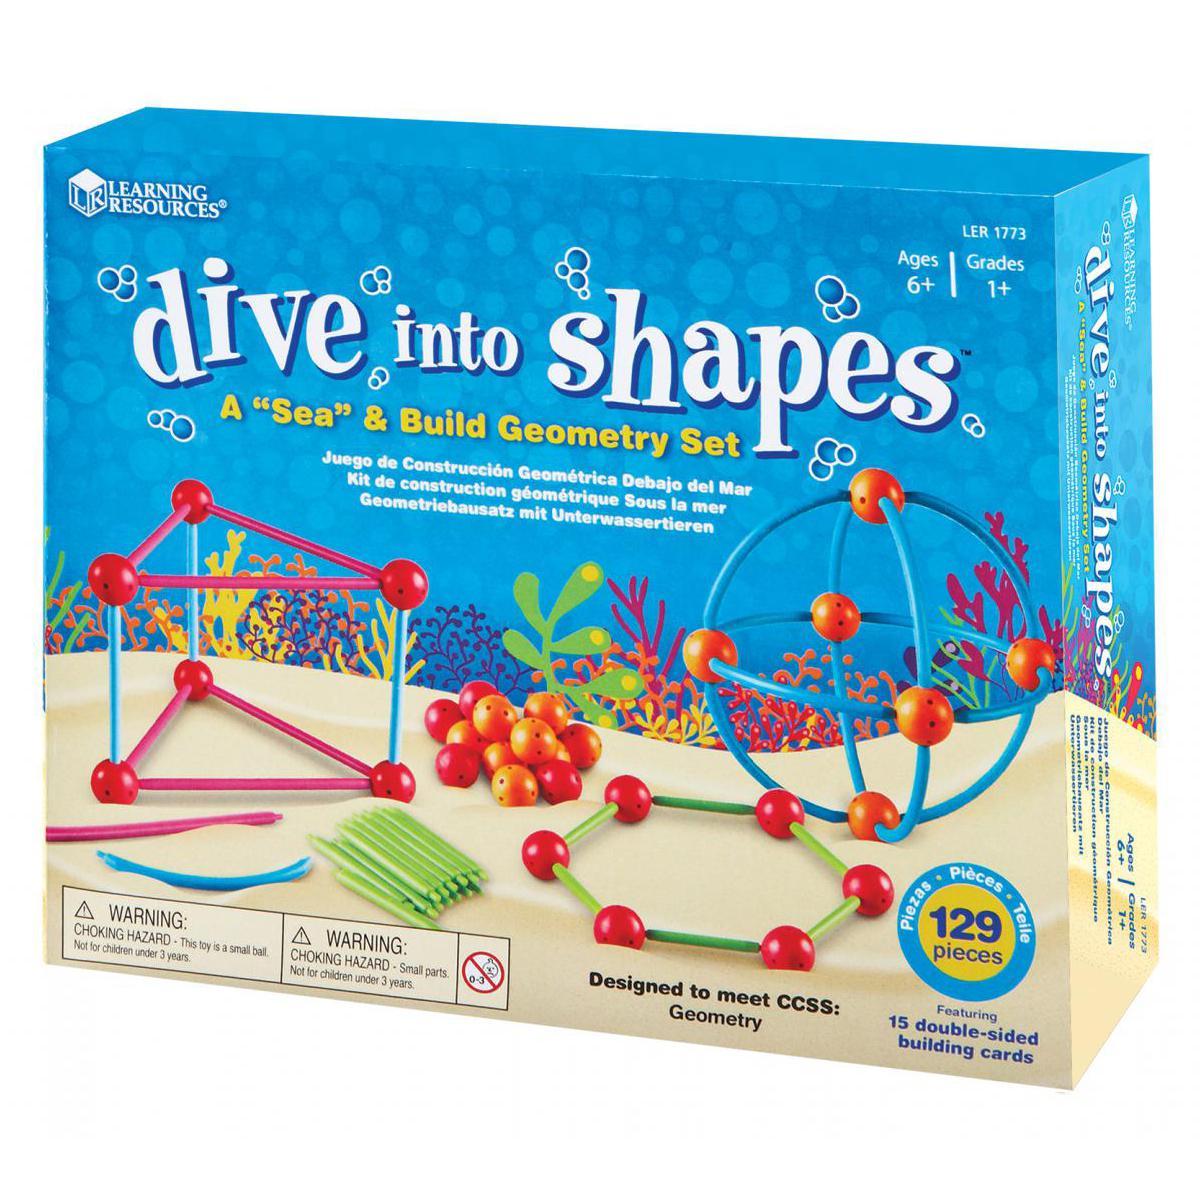 "Dive into Shapes: A ""Sea"" & Build Geometry Set"